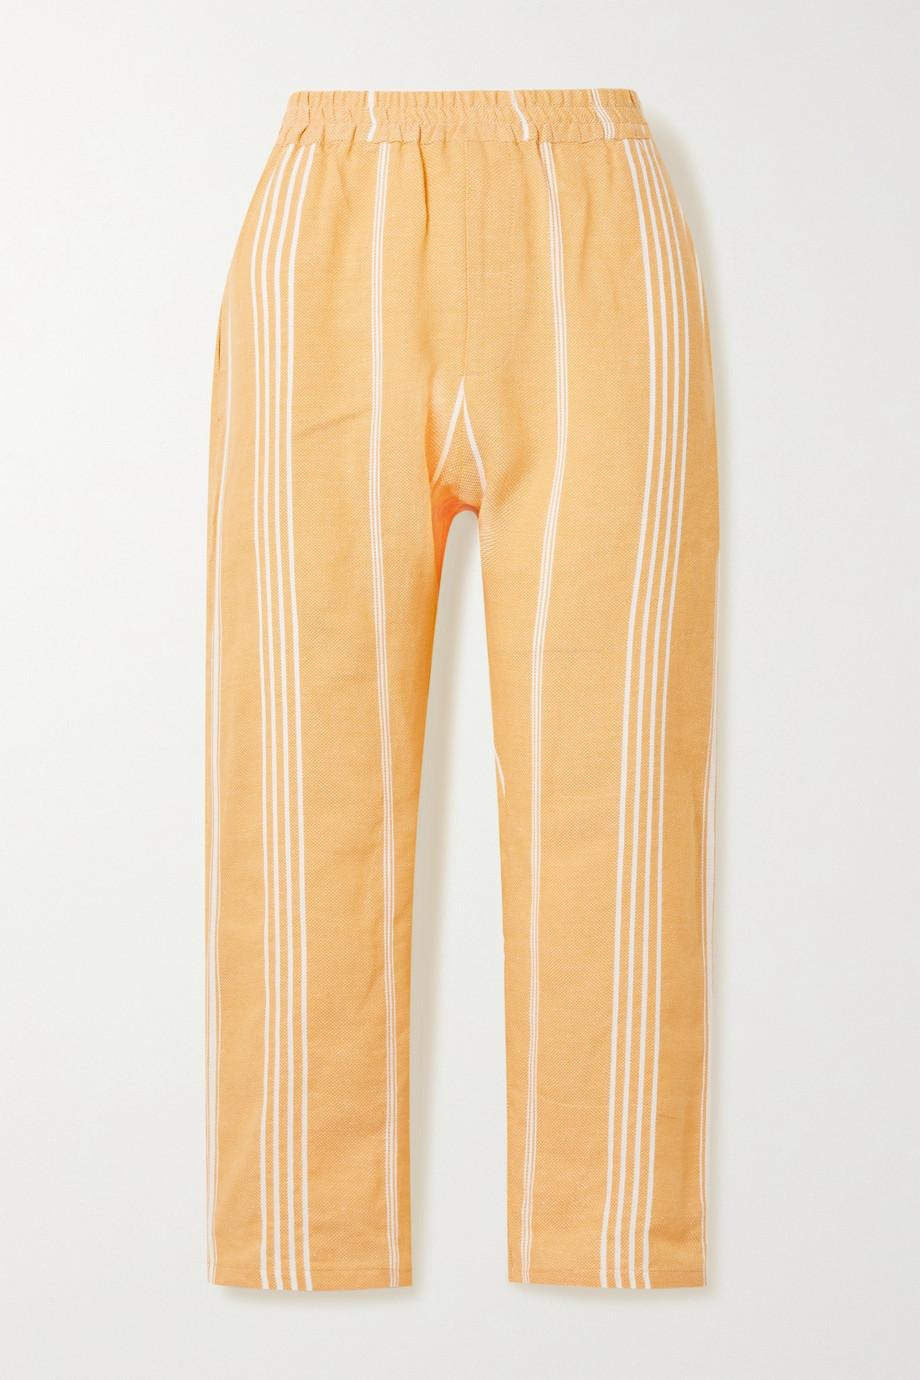 Paradised + NET SUSTAIN striped cotton pants